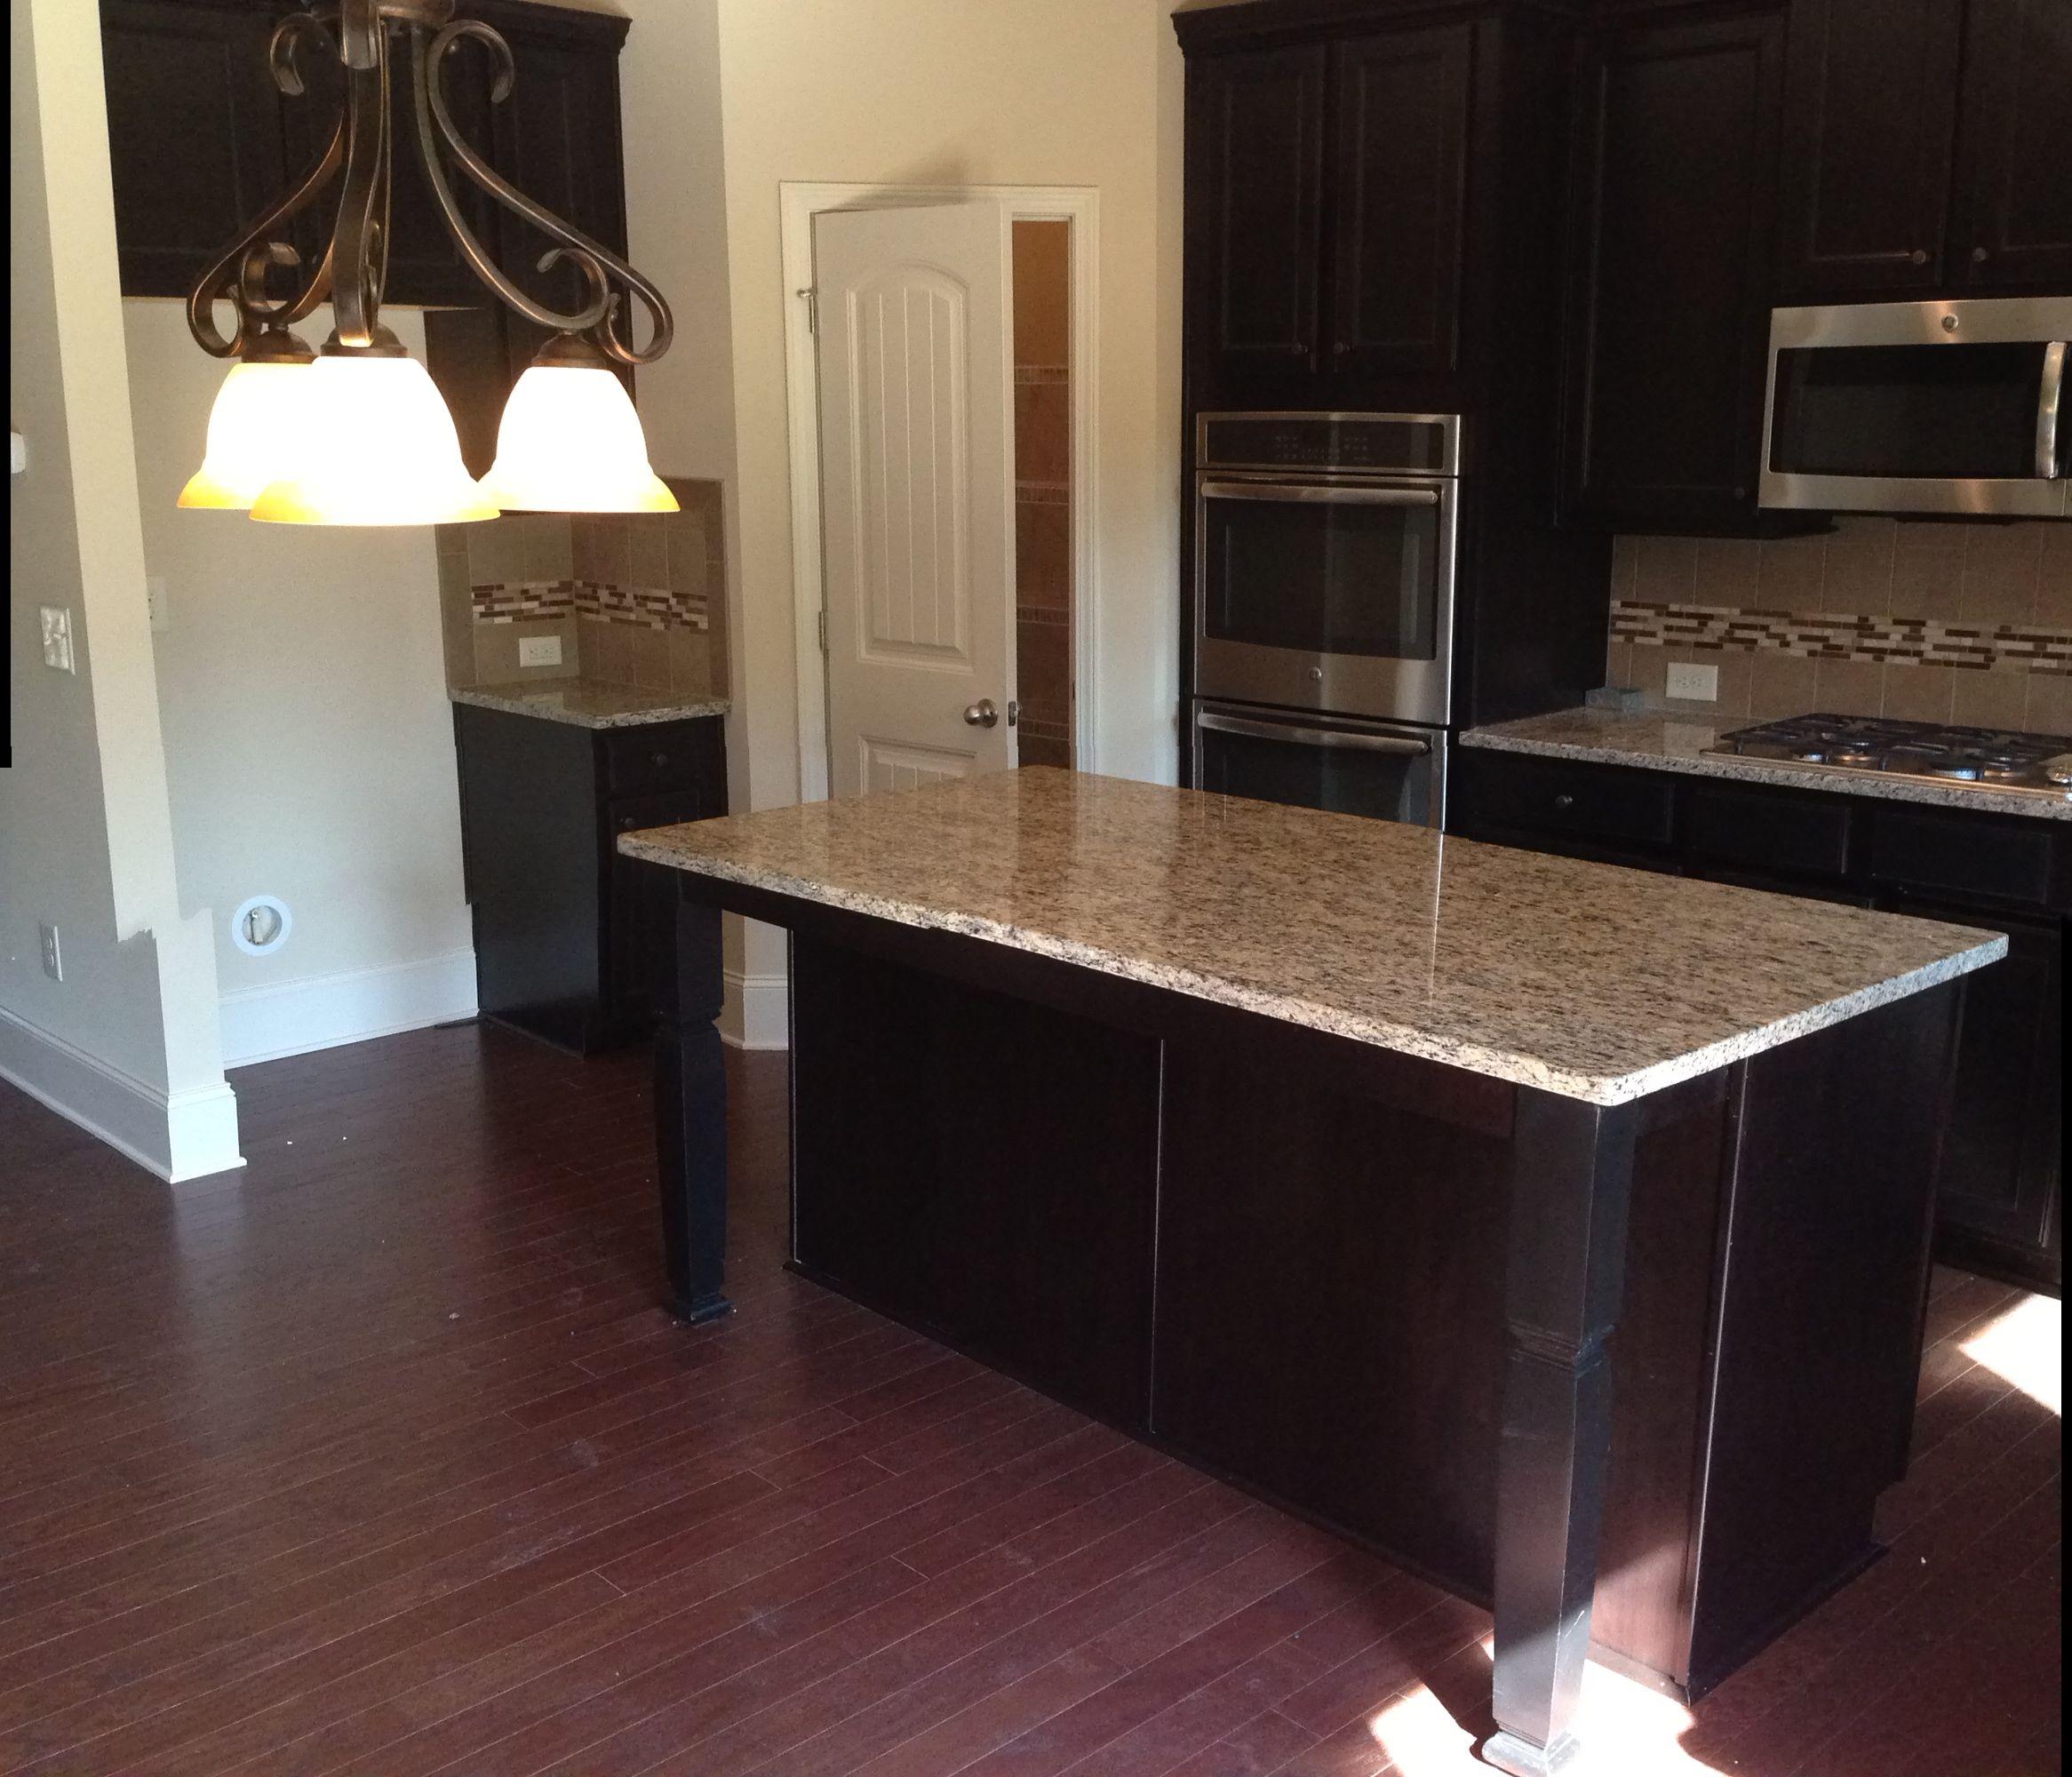 6 By 3 Island Lenox Floor Plan Beautiful Homes Home Builders Oversize Island